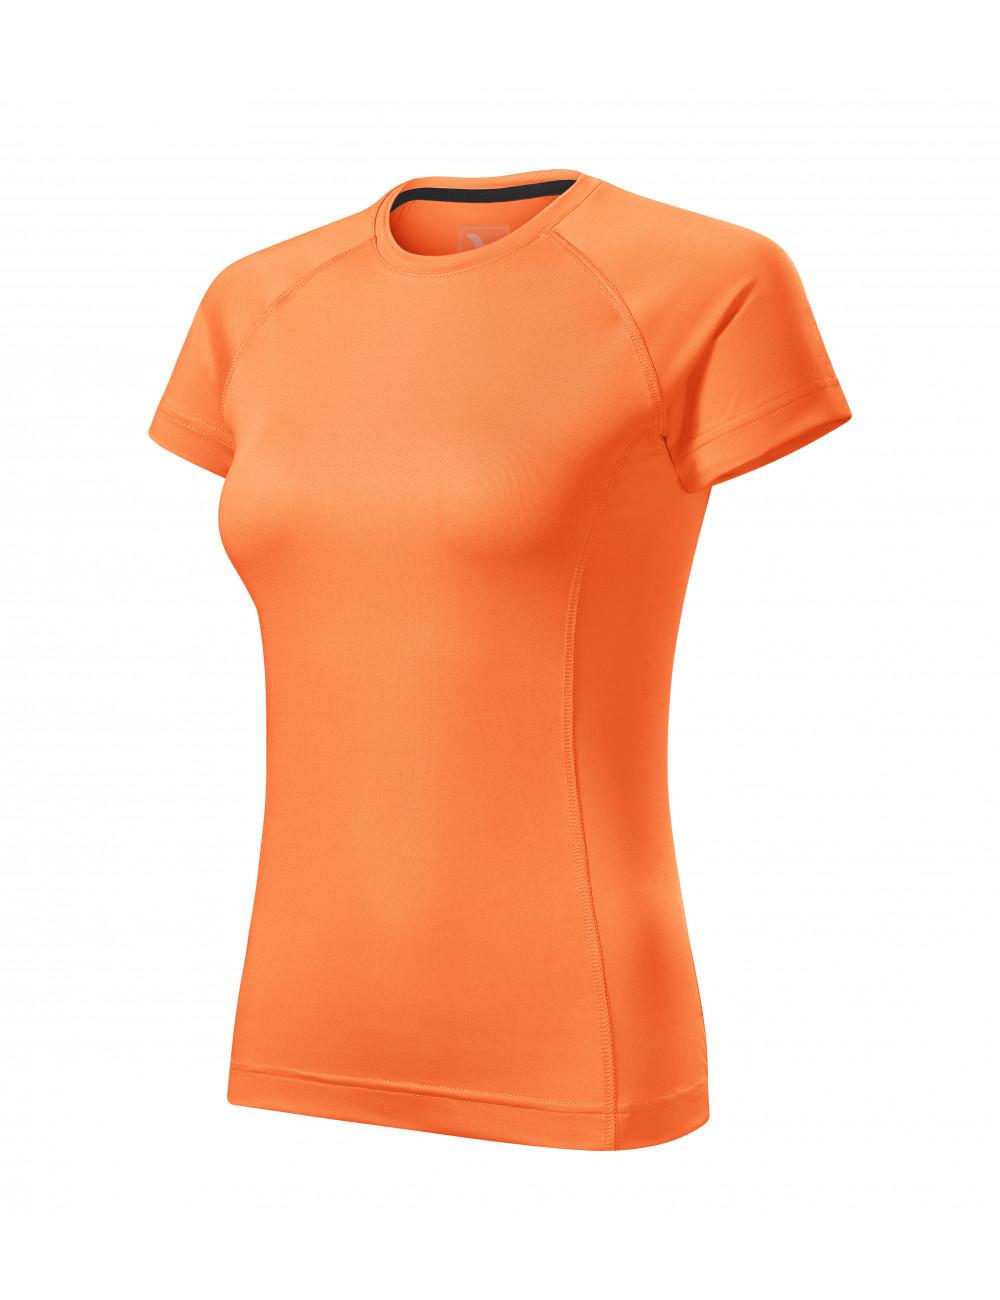 Adler MALFINI Koszulka damska Destiny 176 neon mandarine